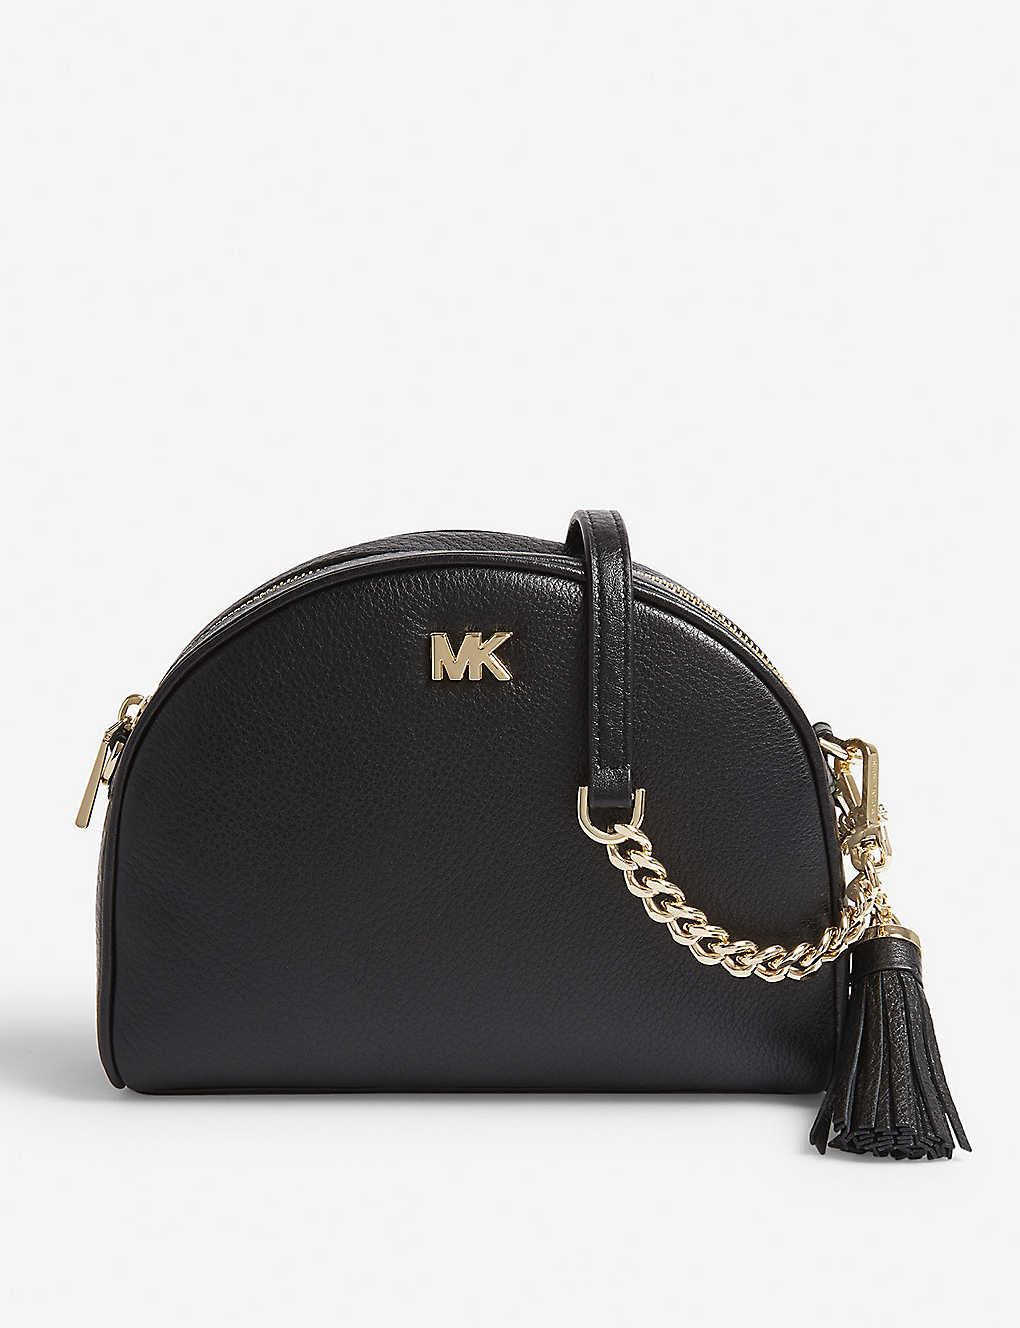 463c088f52 MICHAEL MICHAEL KORS - Half-moon pebbled leather shoulder bag ...